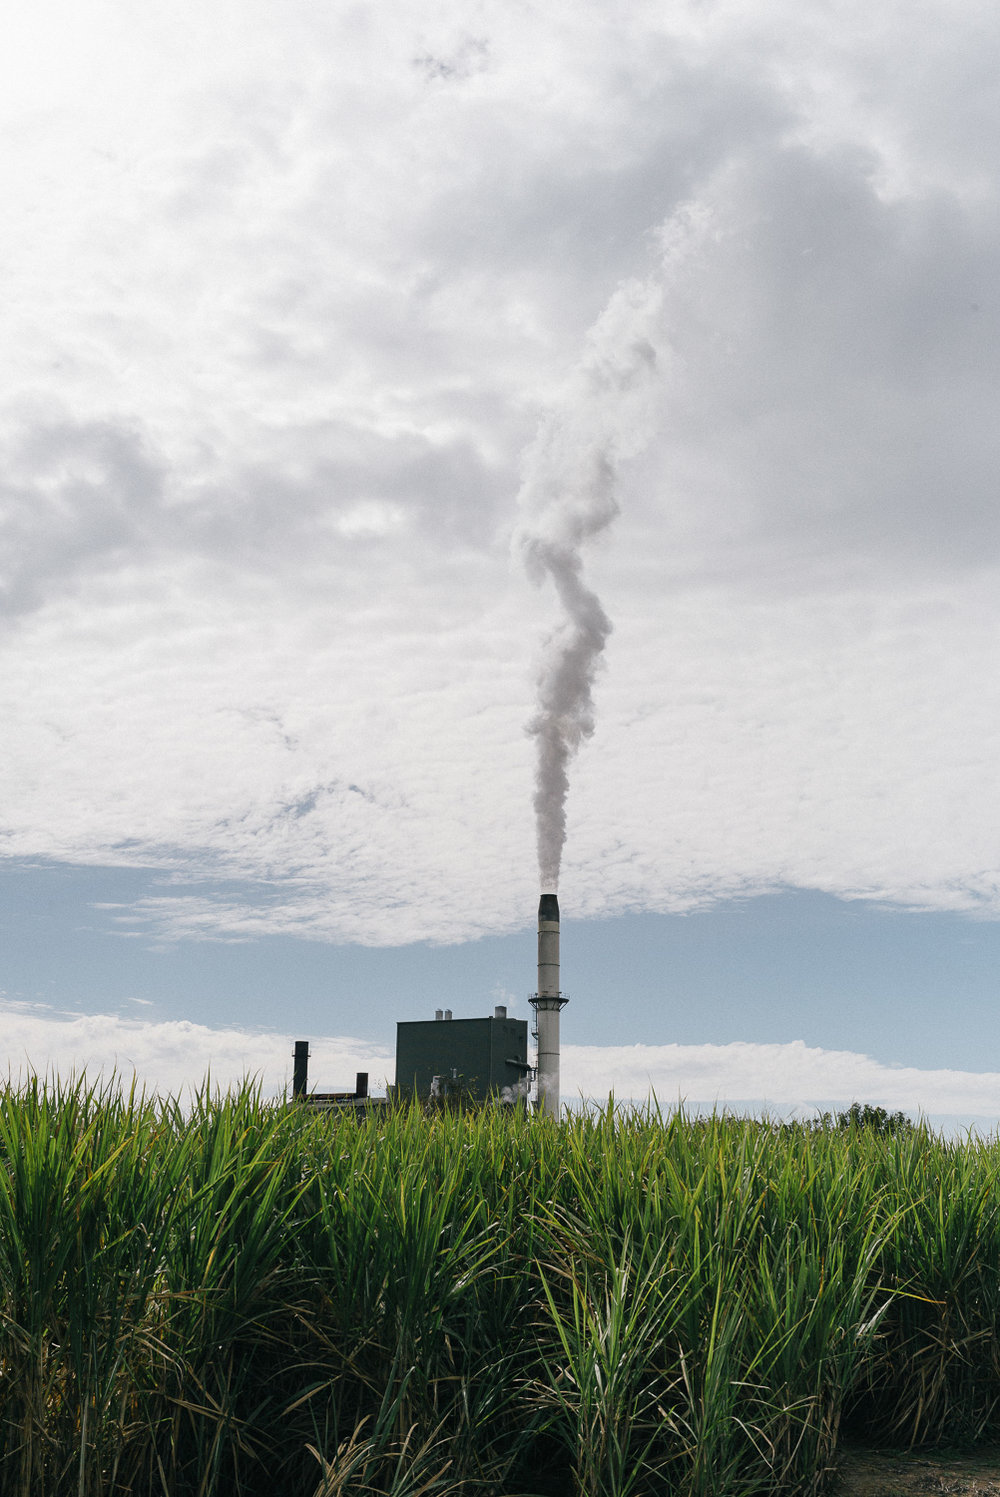 Sugar cane mill in Murwillumbah.